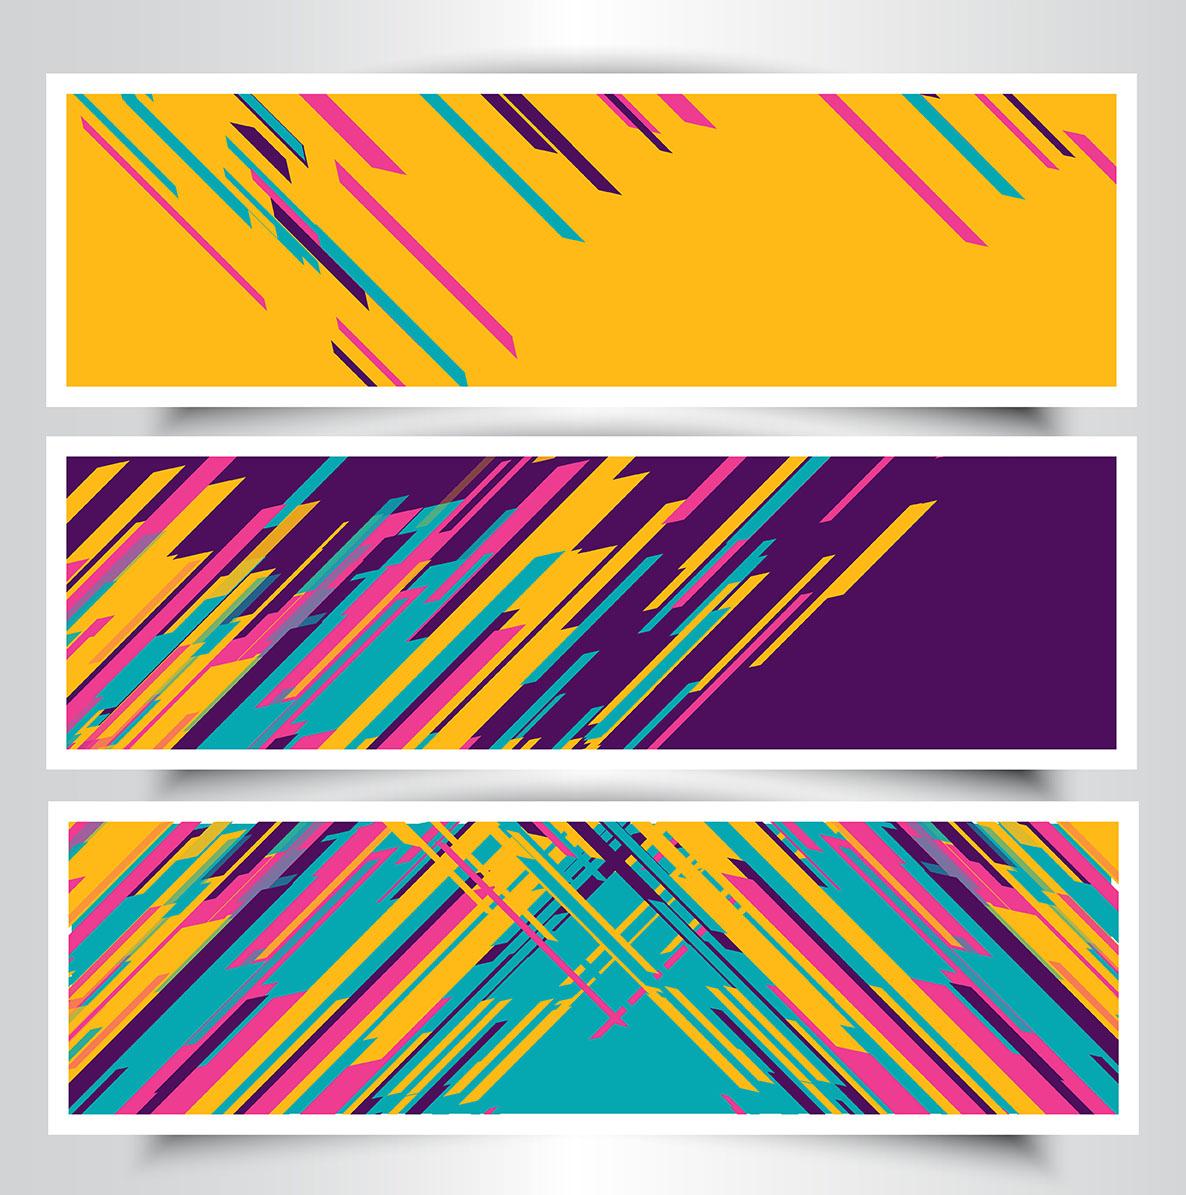 Modern banner designs - Download Free Vectors, Clipart ...